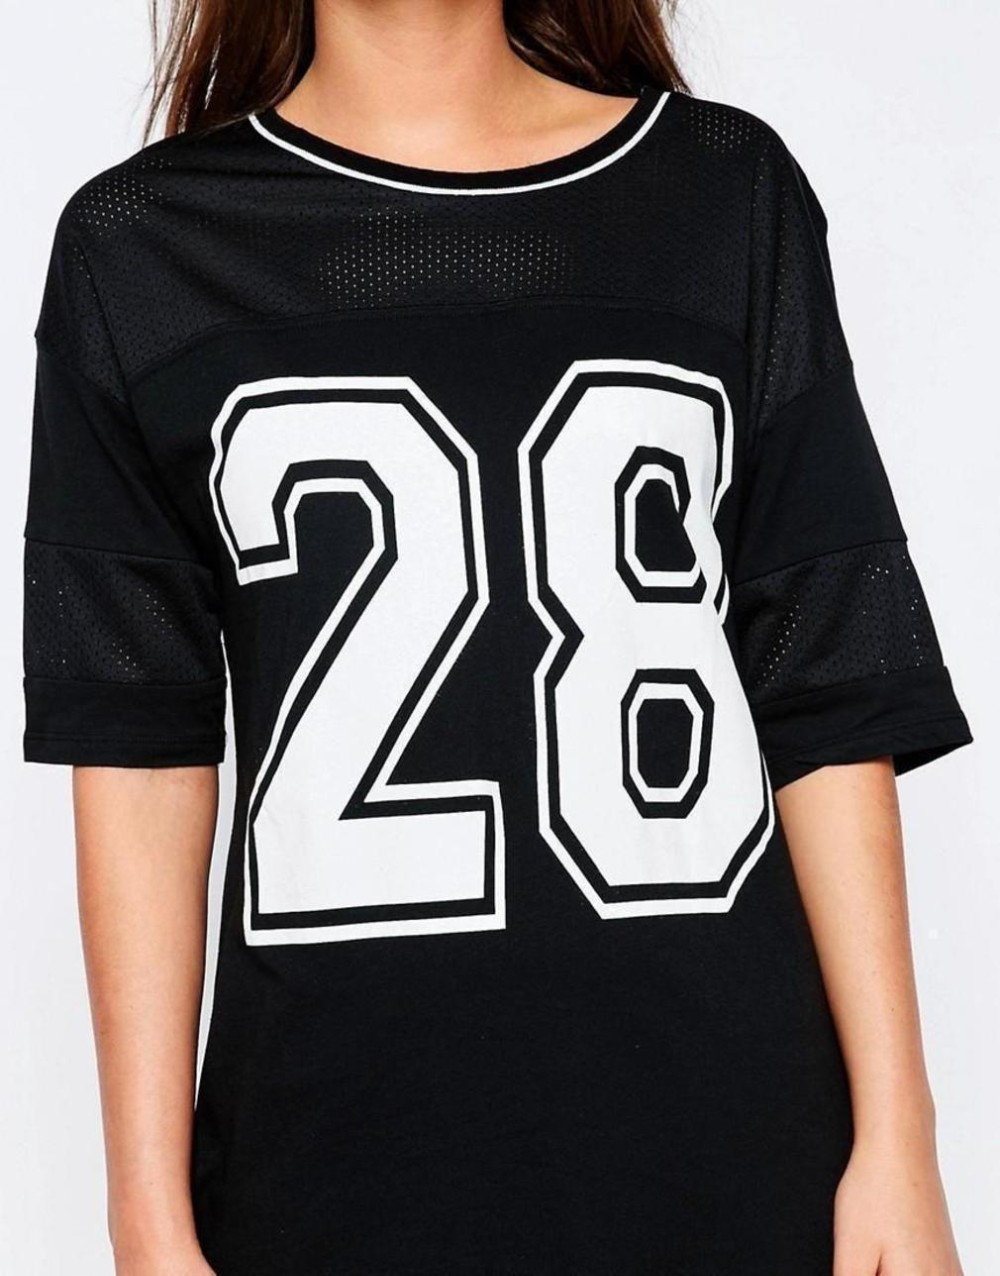 Custom patch logo black baseball t shirts baseball jersey for Baseball jersey shirt dress